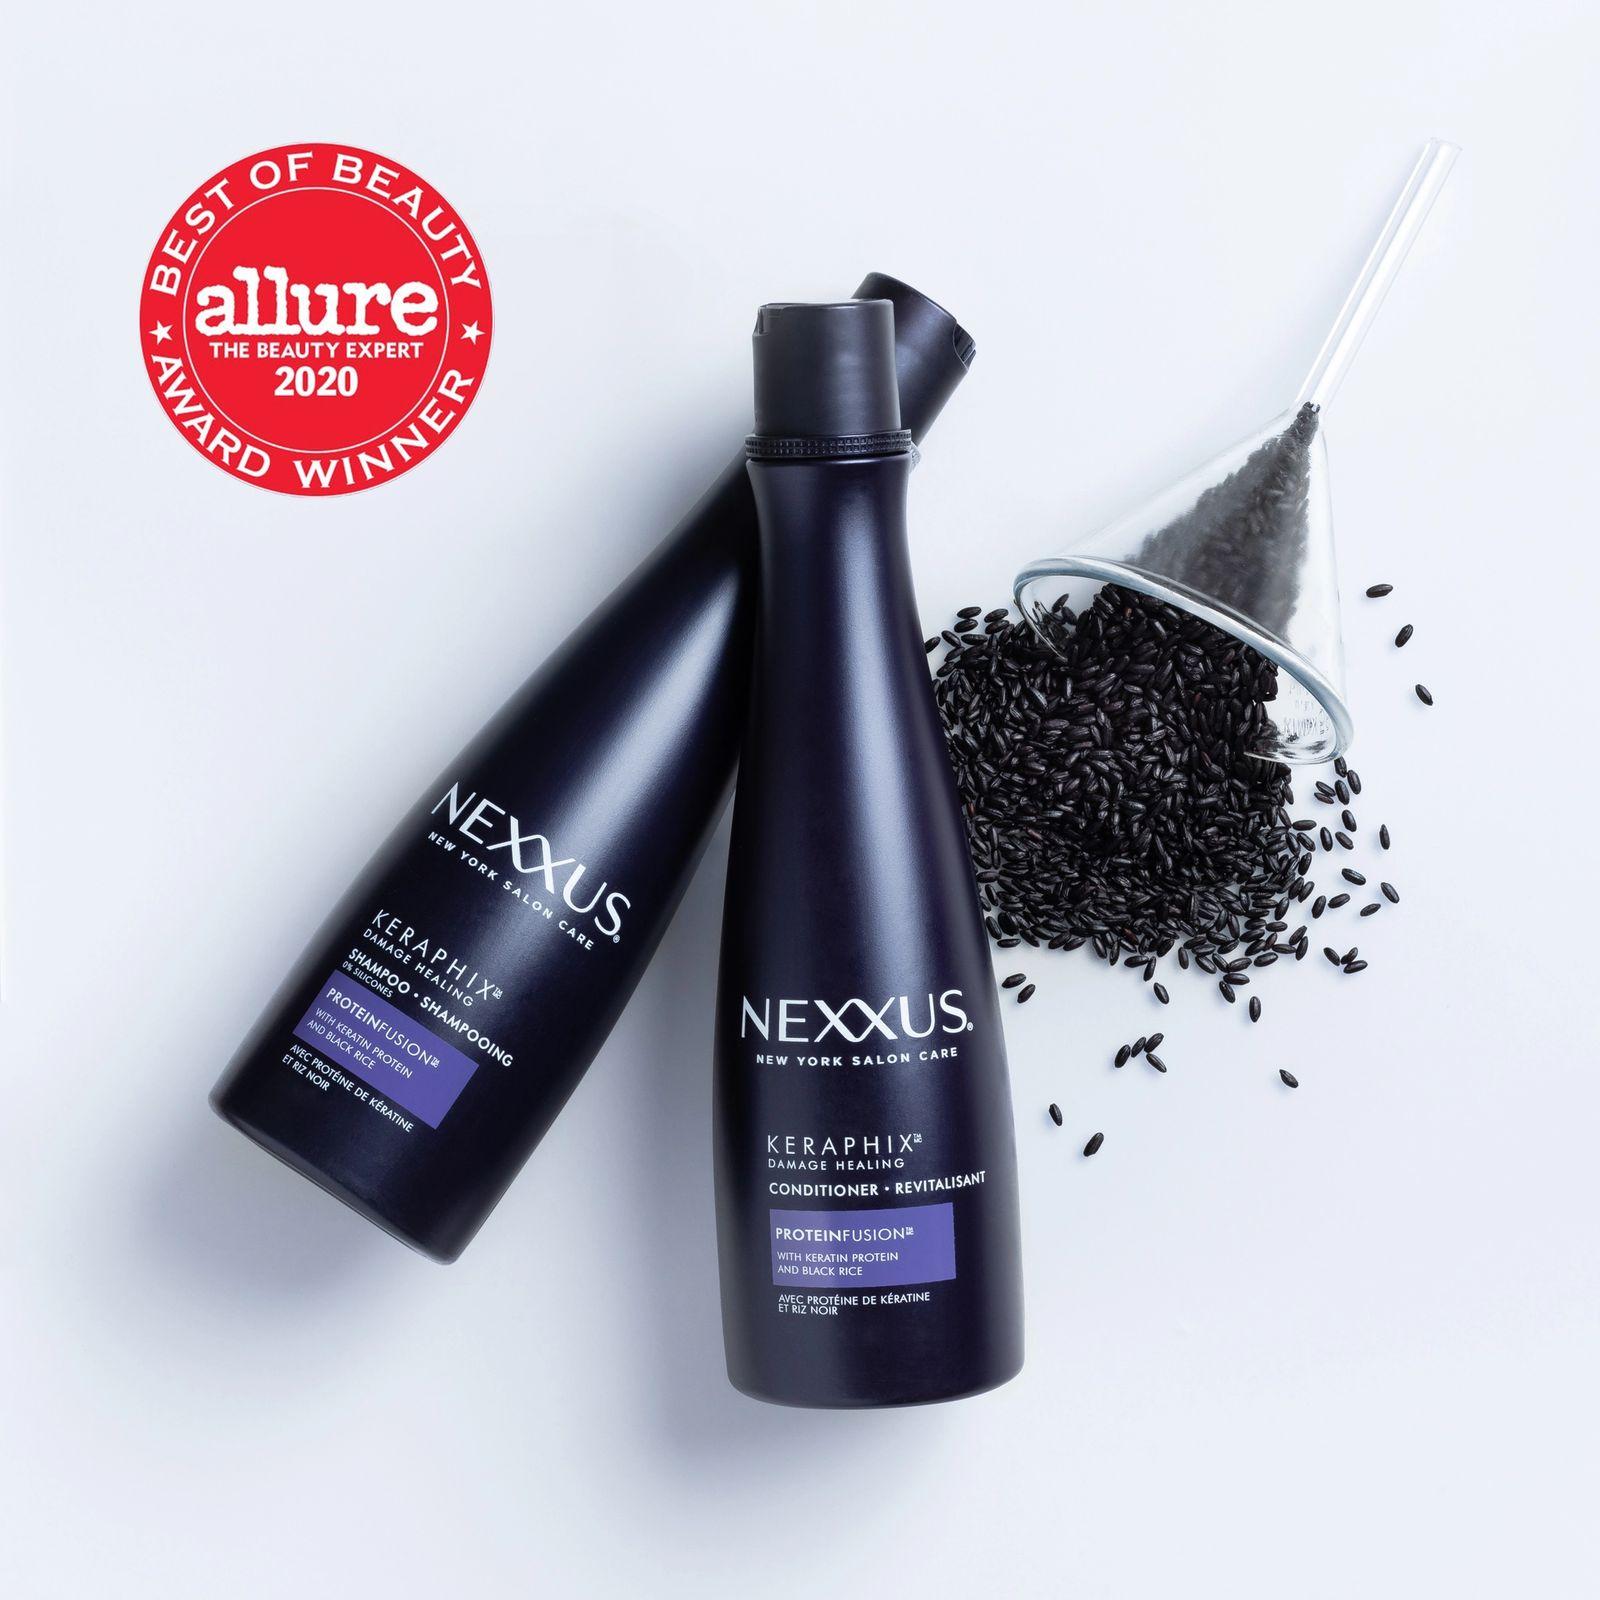 nexxus keraphix shampoo and conditioner and allure logo 2020 beauty winner